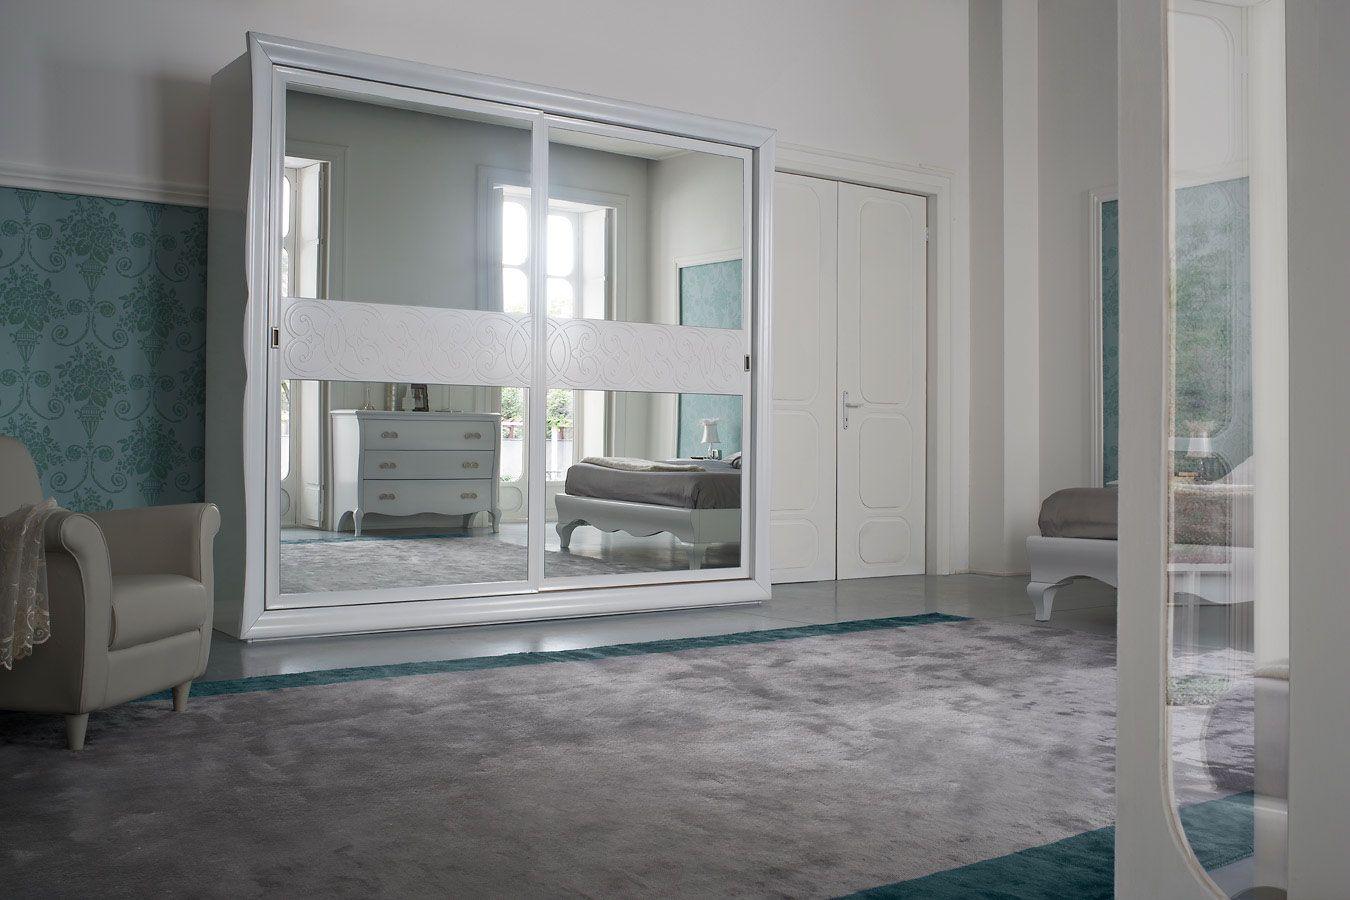 Bedroom Symfonia in White Armadio specchio, Armadio a